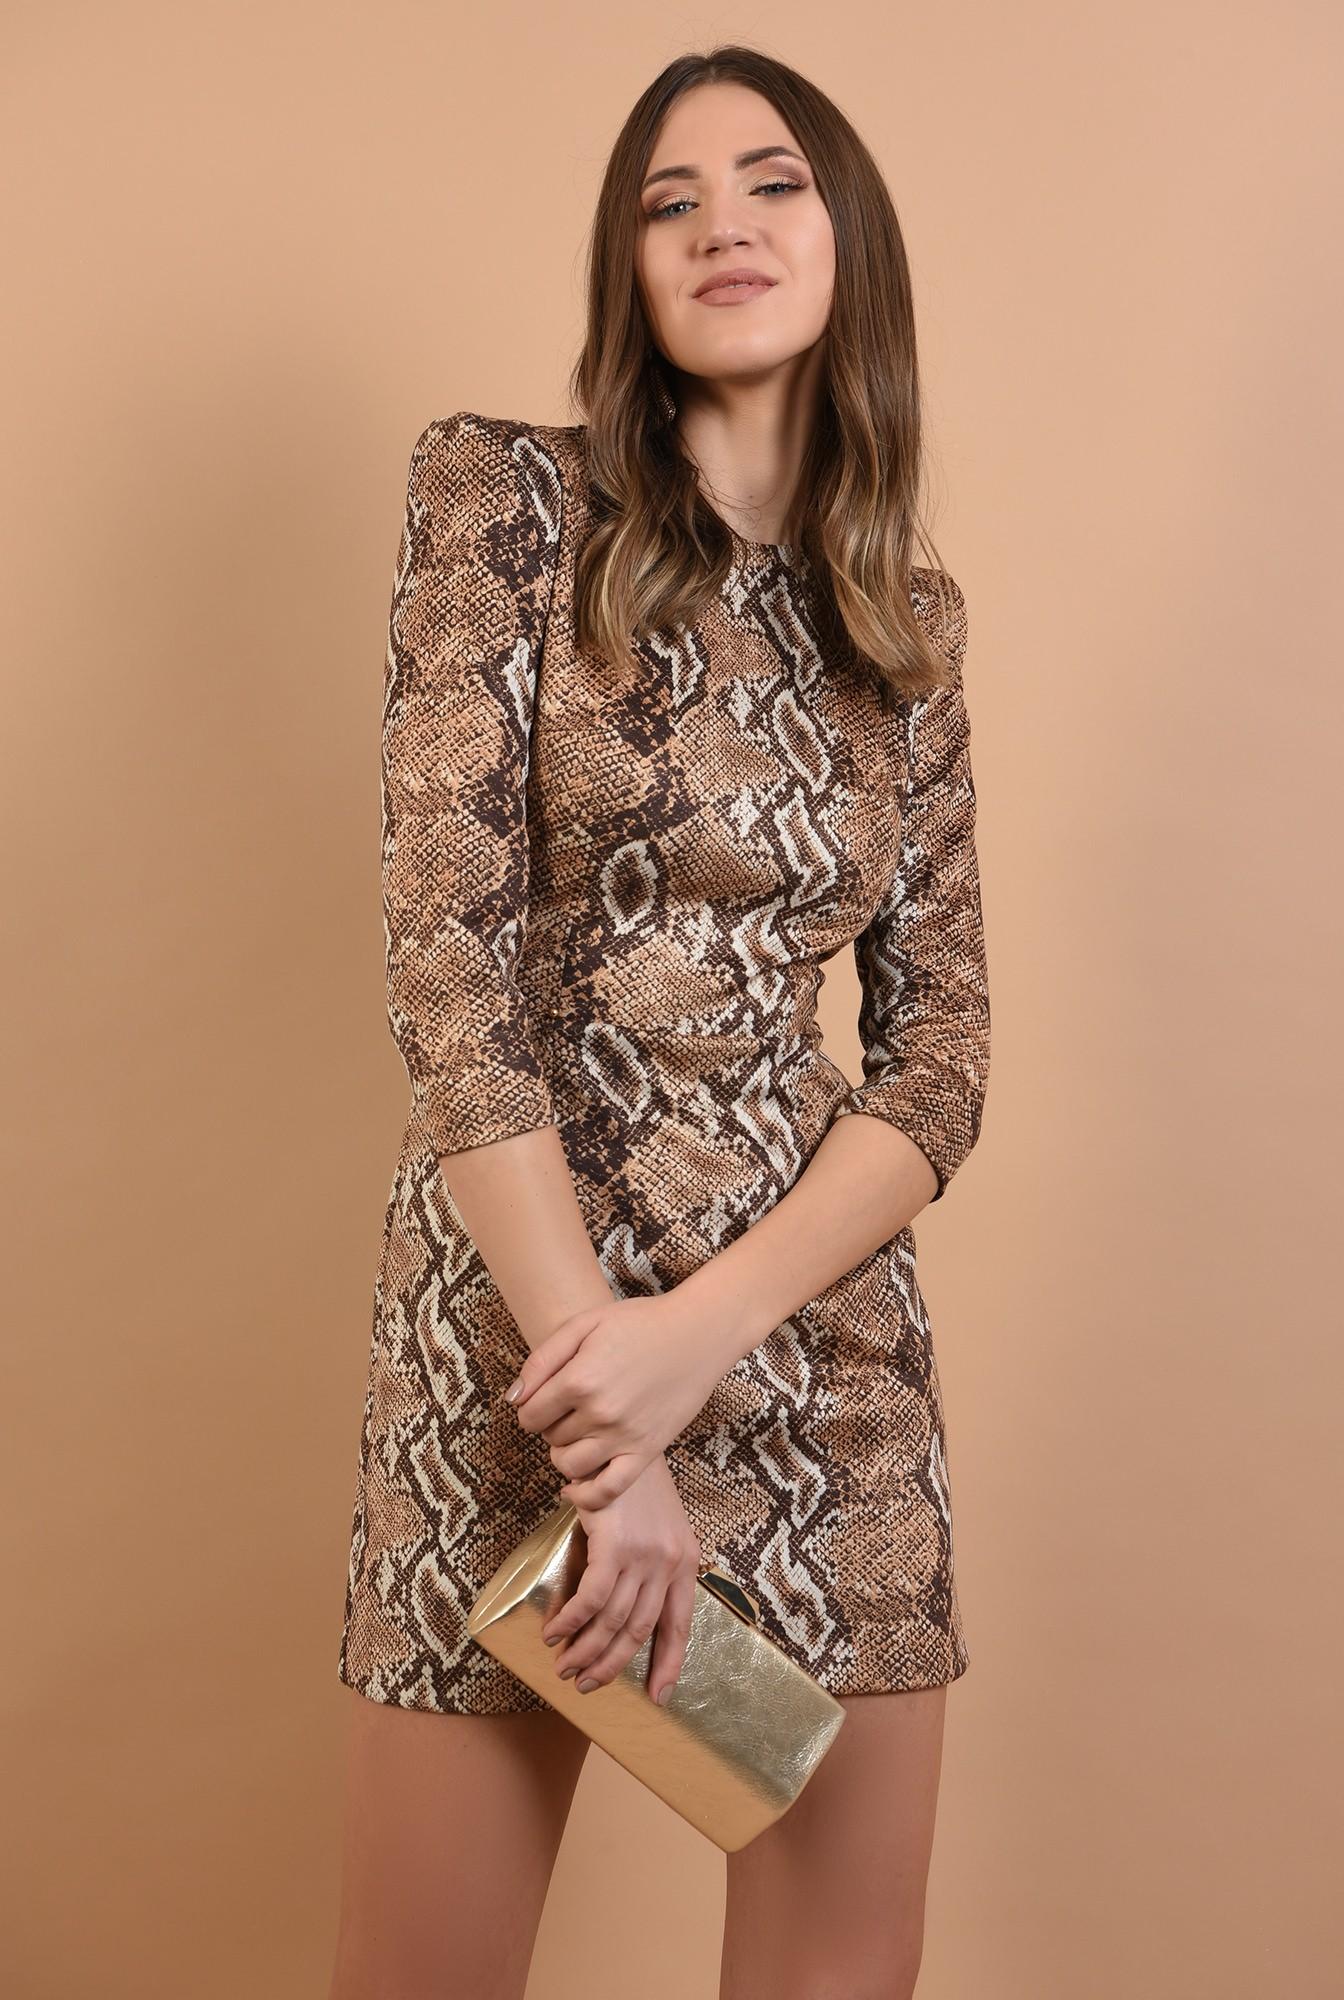 0 - 360 - rochie eleganta, scurta, animal print, maneci midi, cambrata